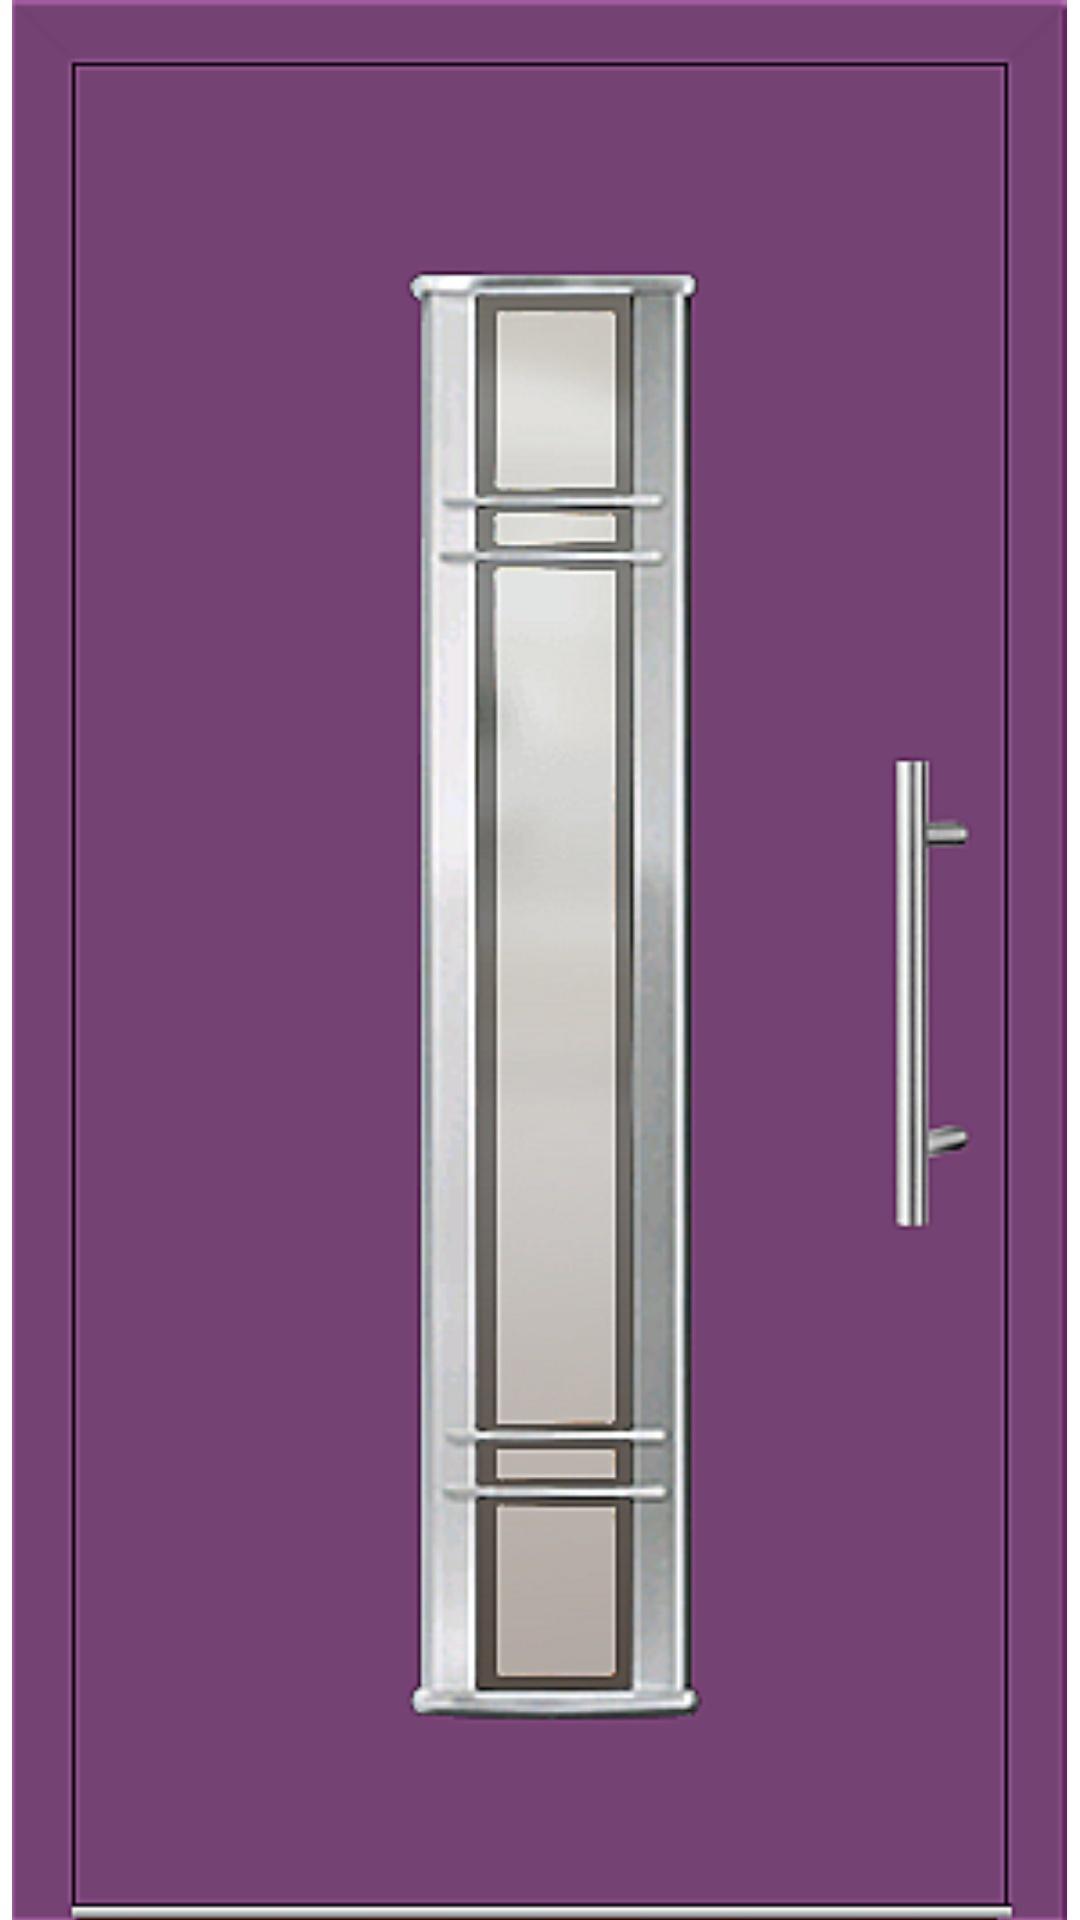 Kunststoff Haustür Modell 6962-79 singalviolett